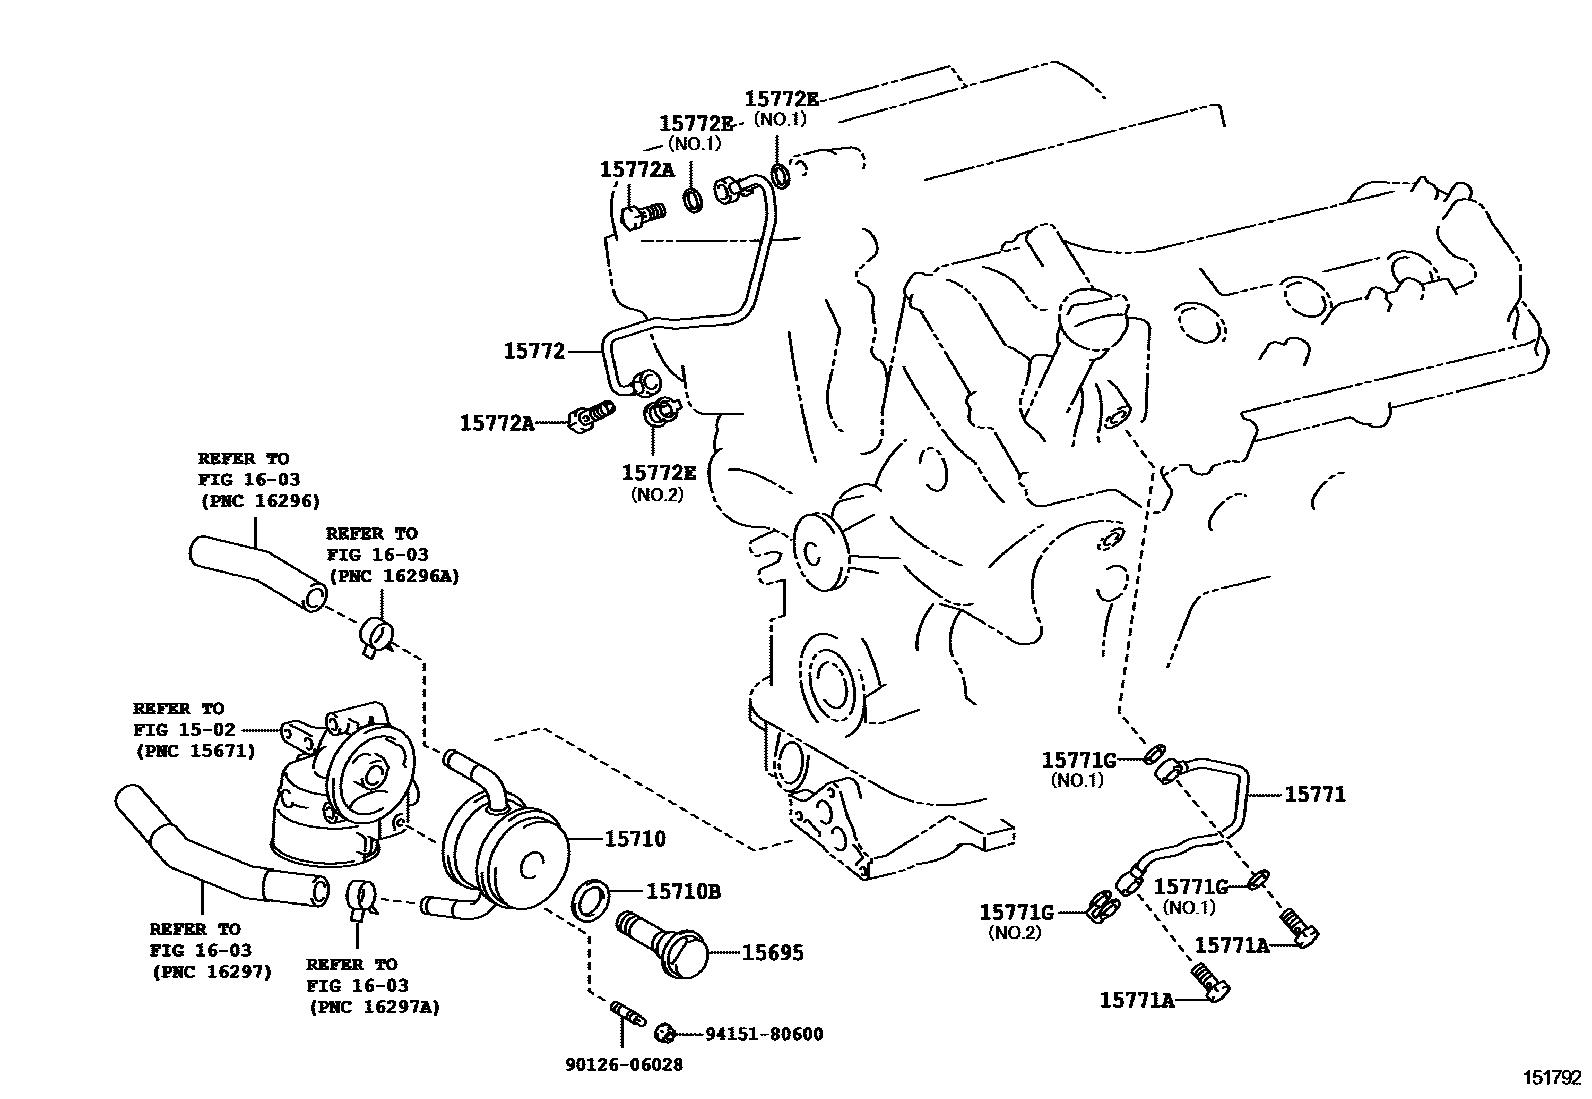 fj cruiser engine part diagram wiring library FJ Cruiser Fuse fj cruiser engine part diagram